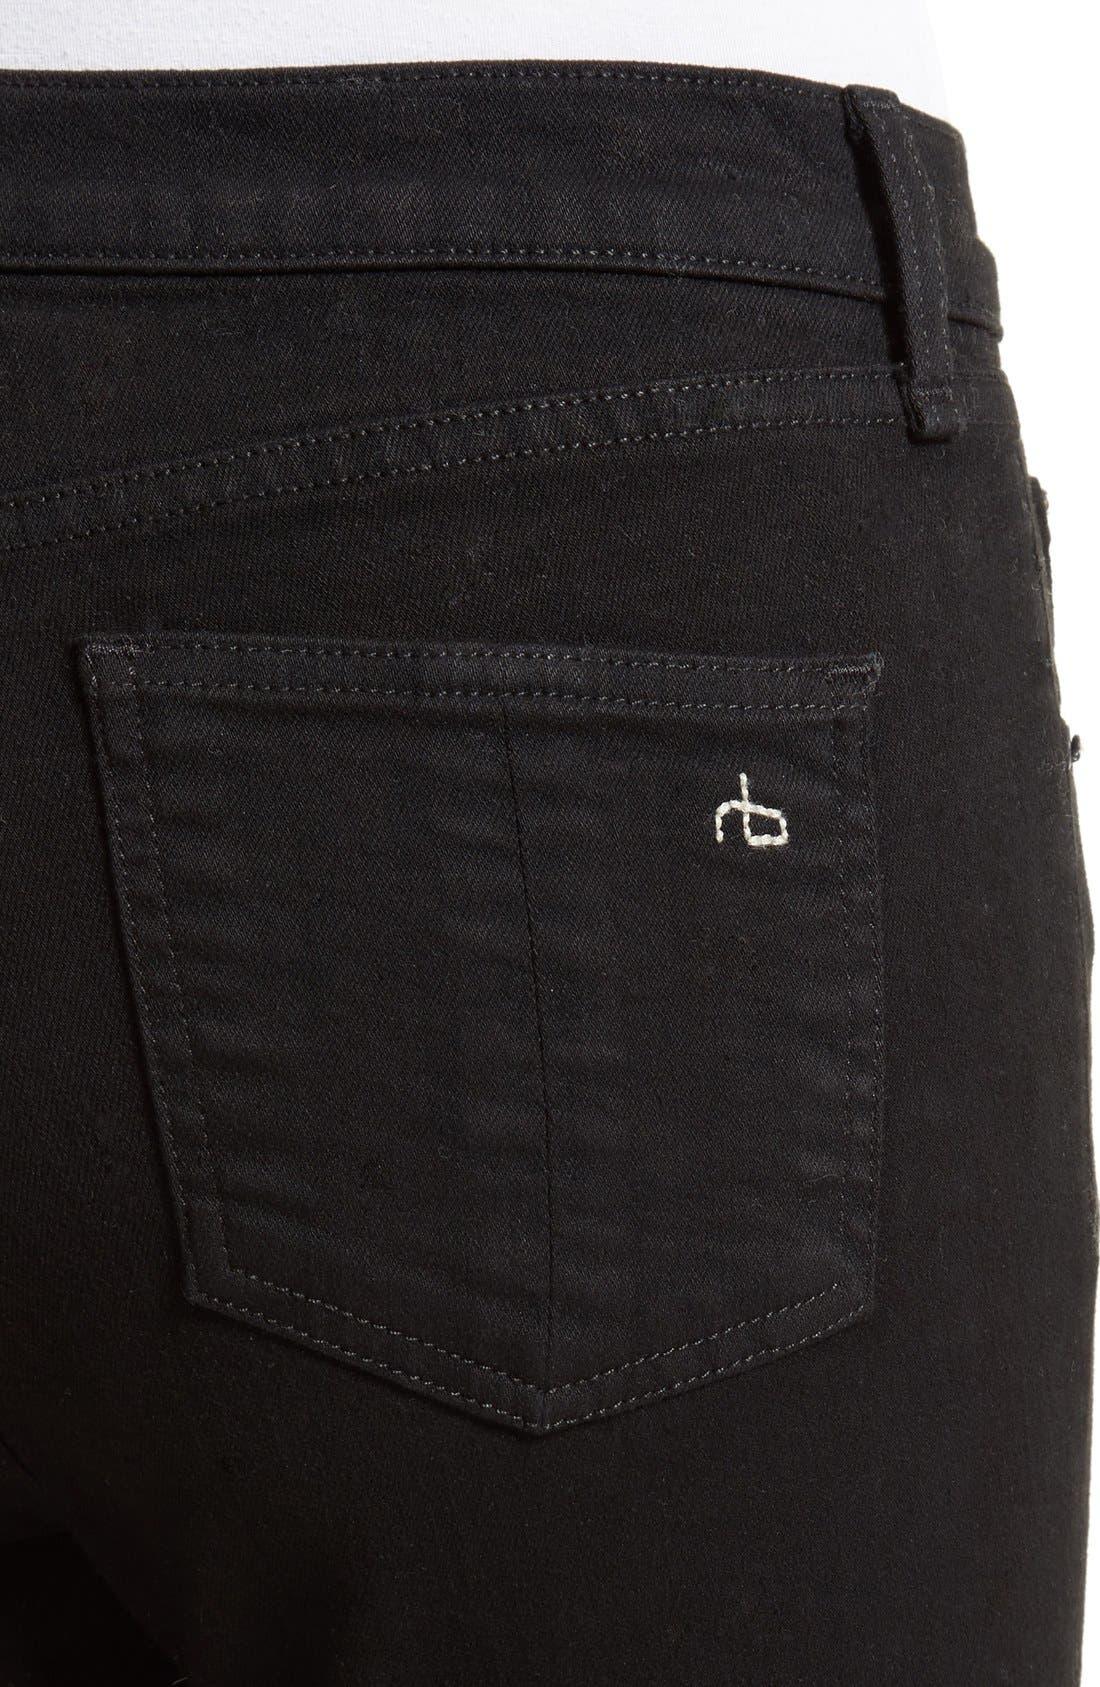 Cutoff Capri Jeans,                             Alternate thumbnail 7, color,                             001